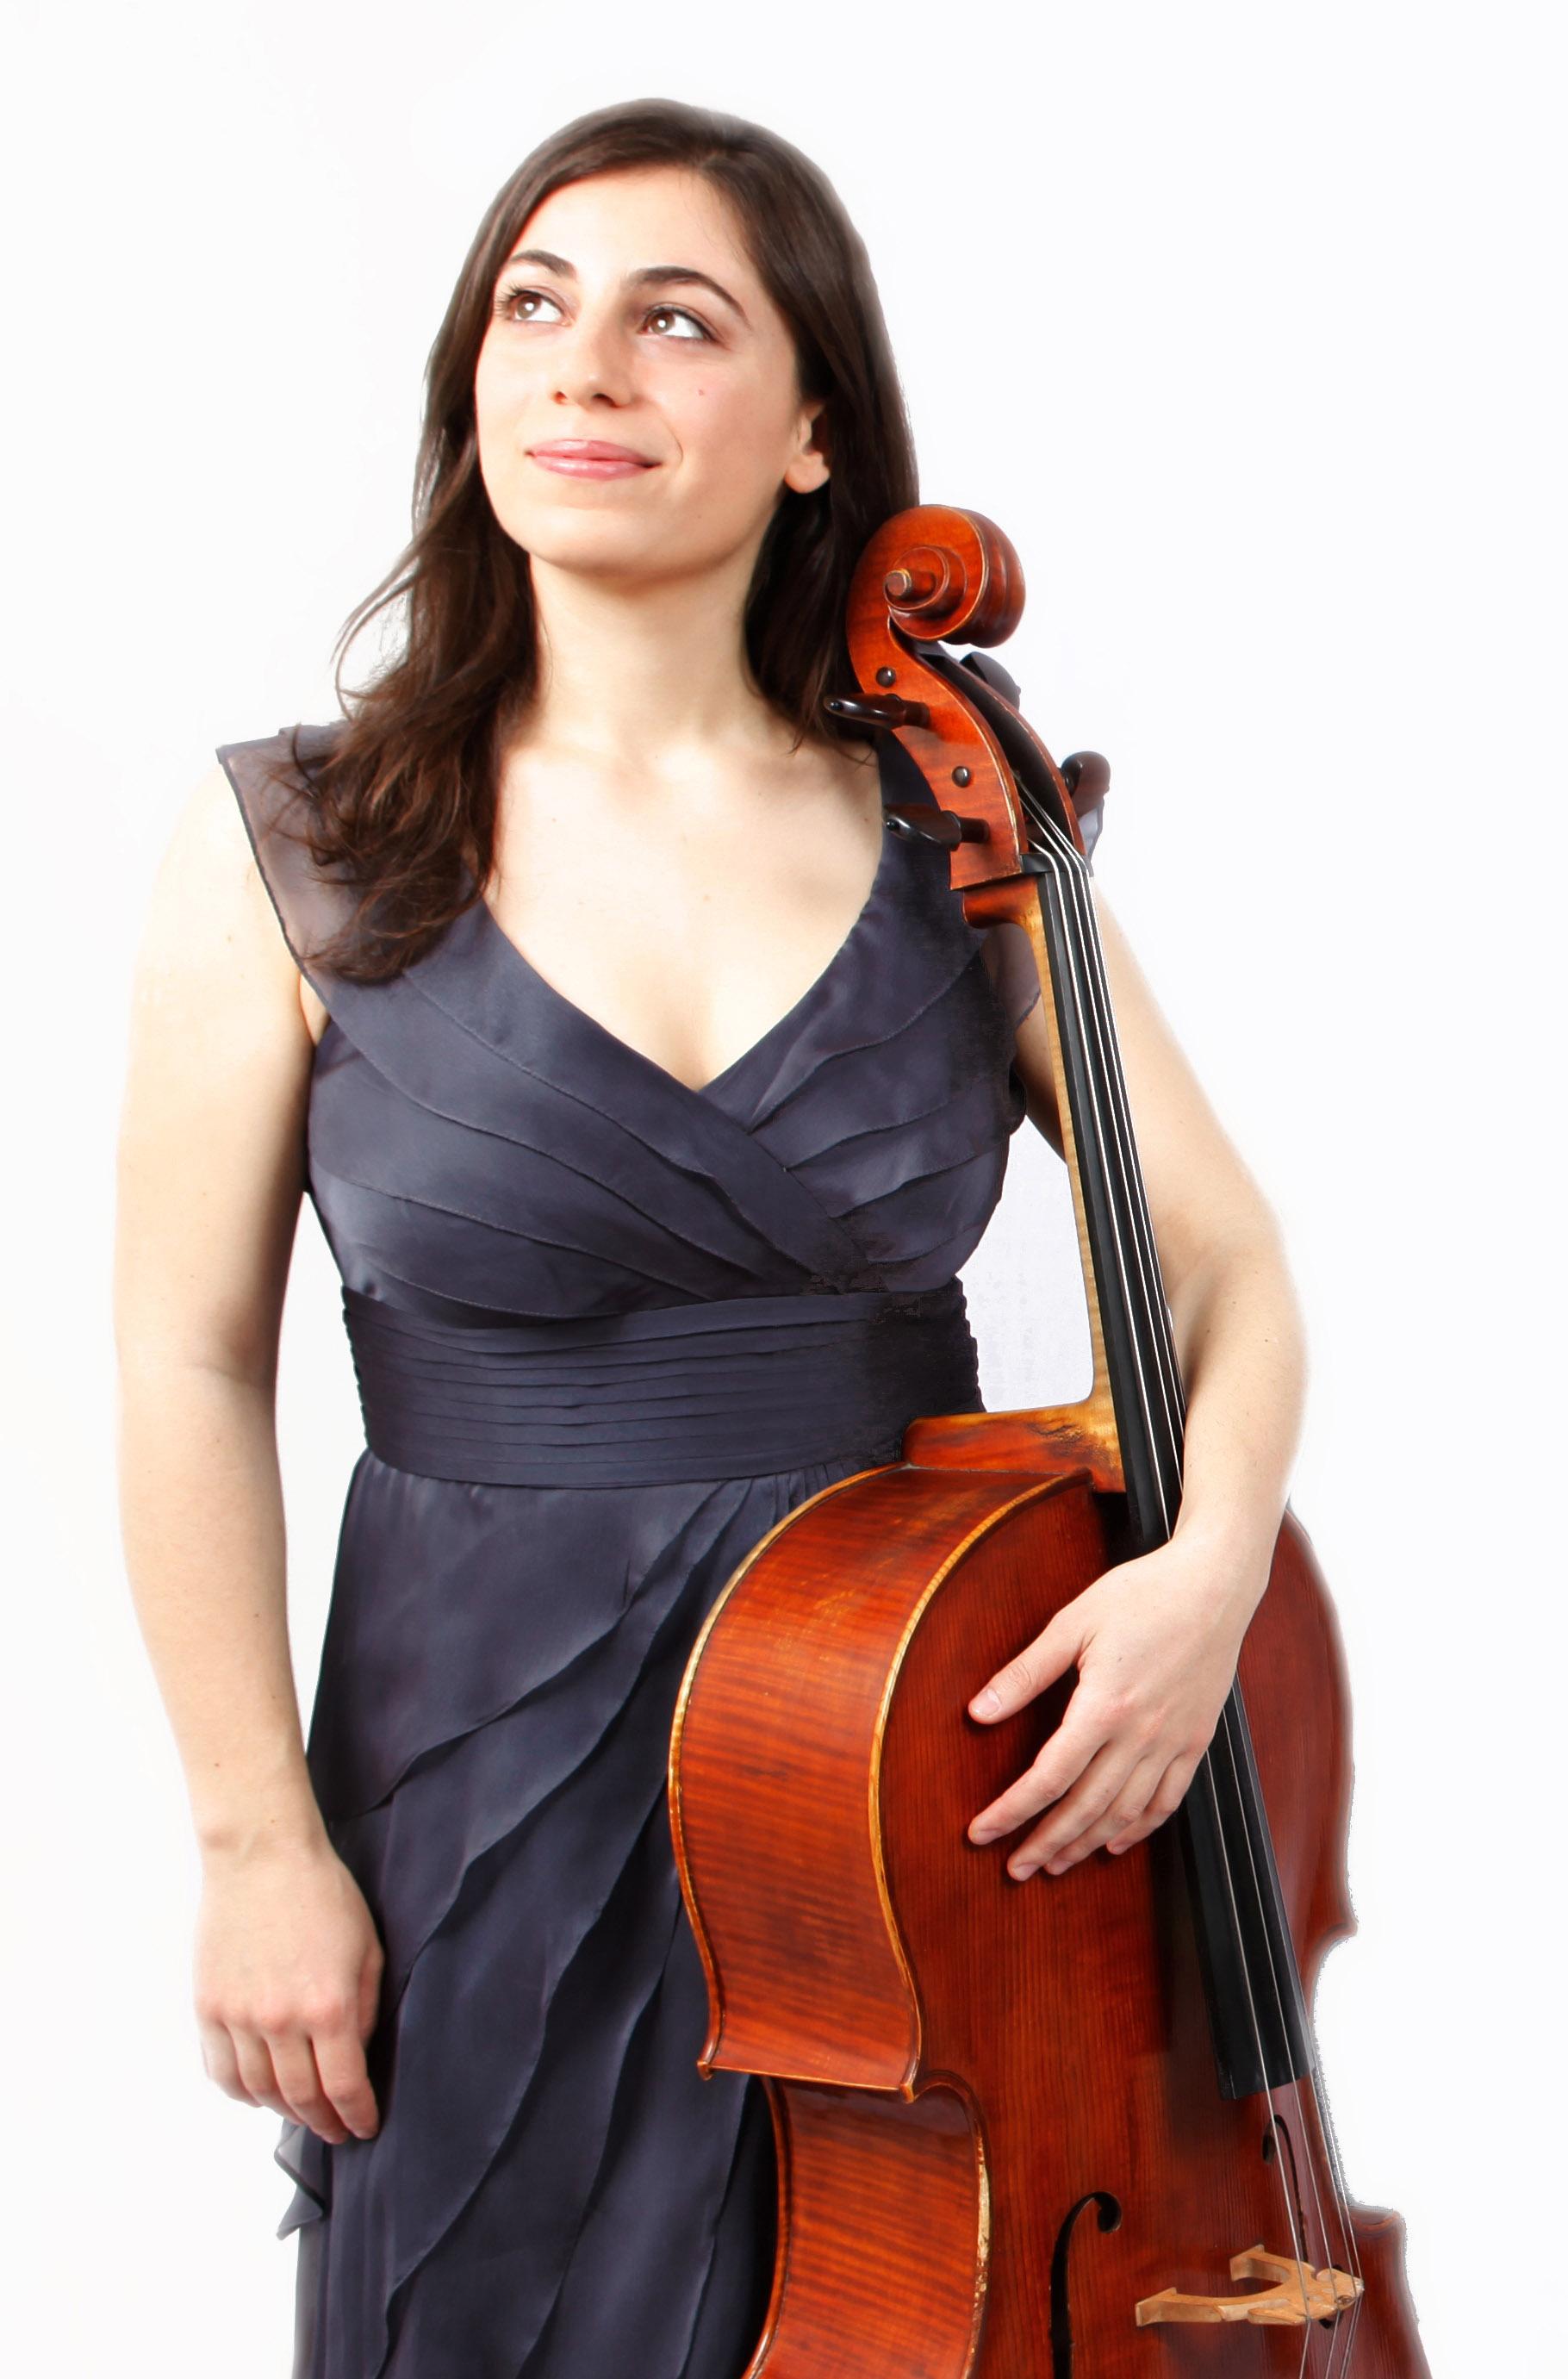 Karen Ouzounian plays on the Con Anima CD